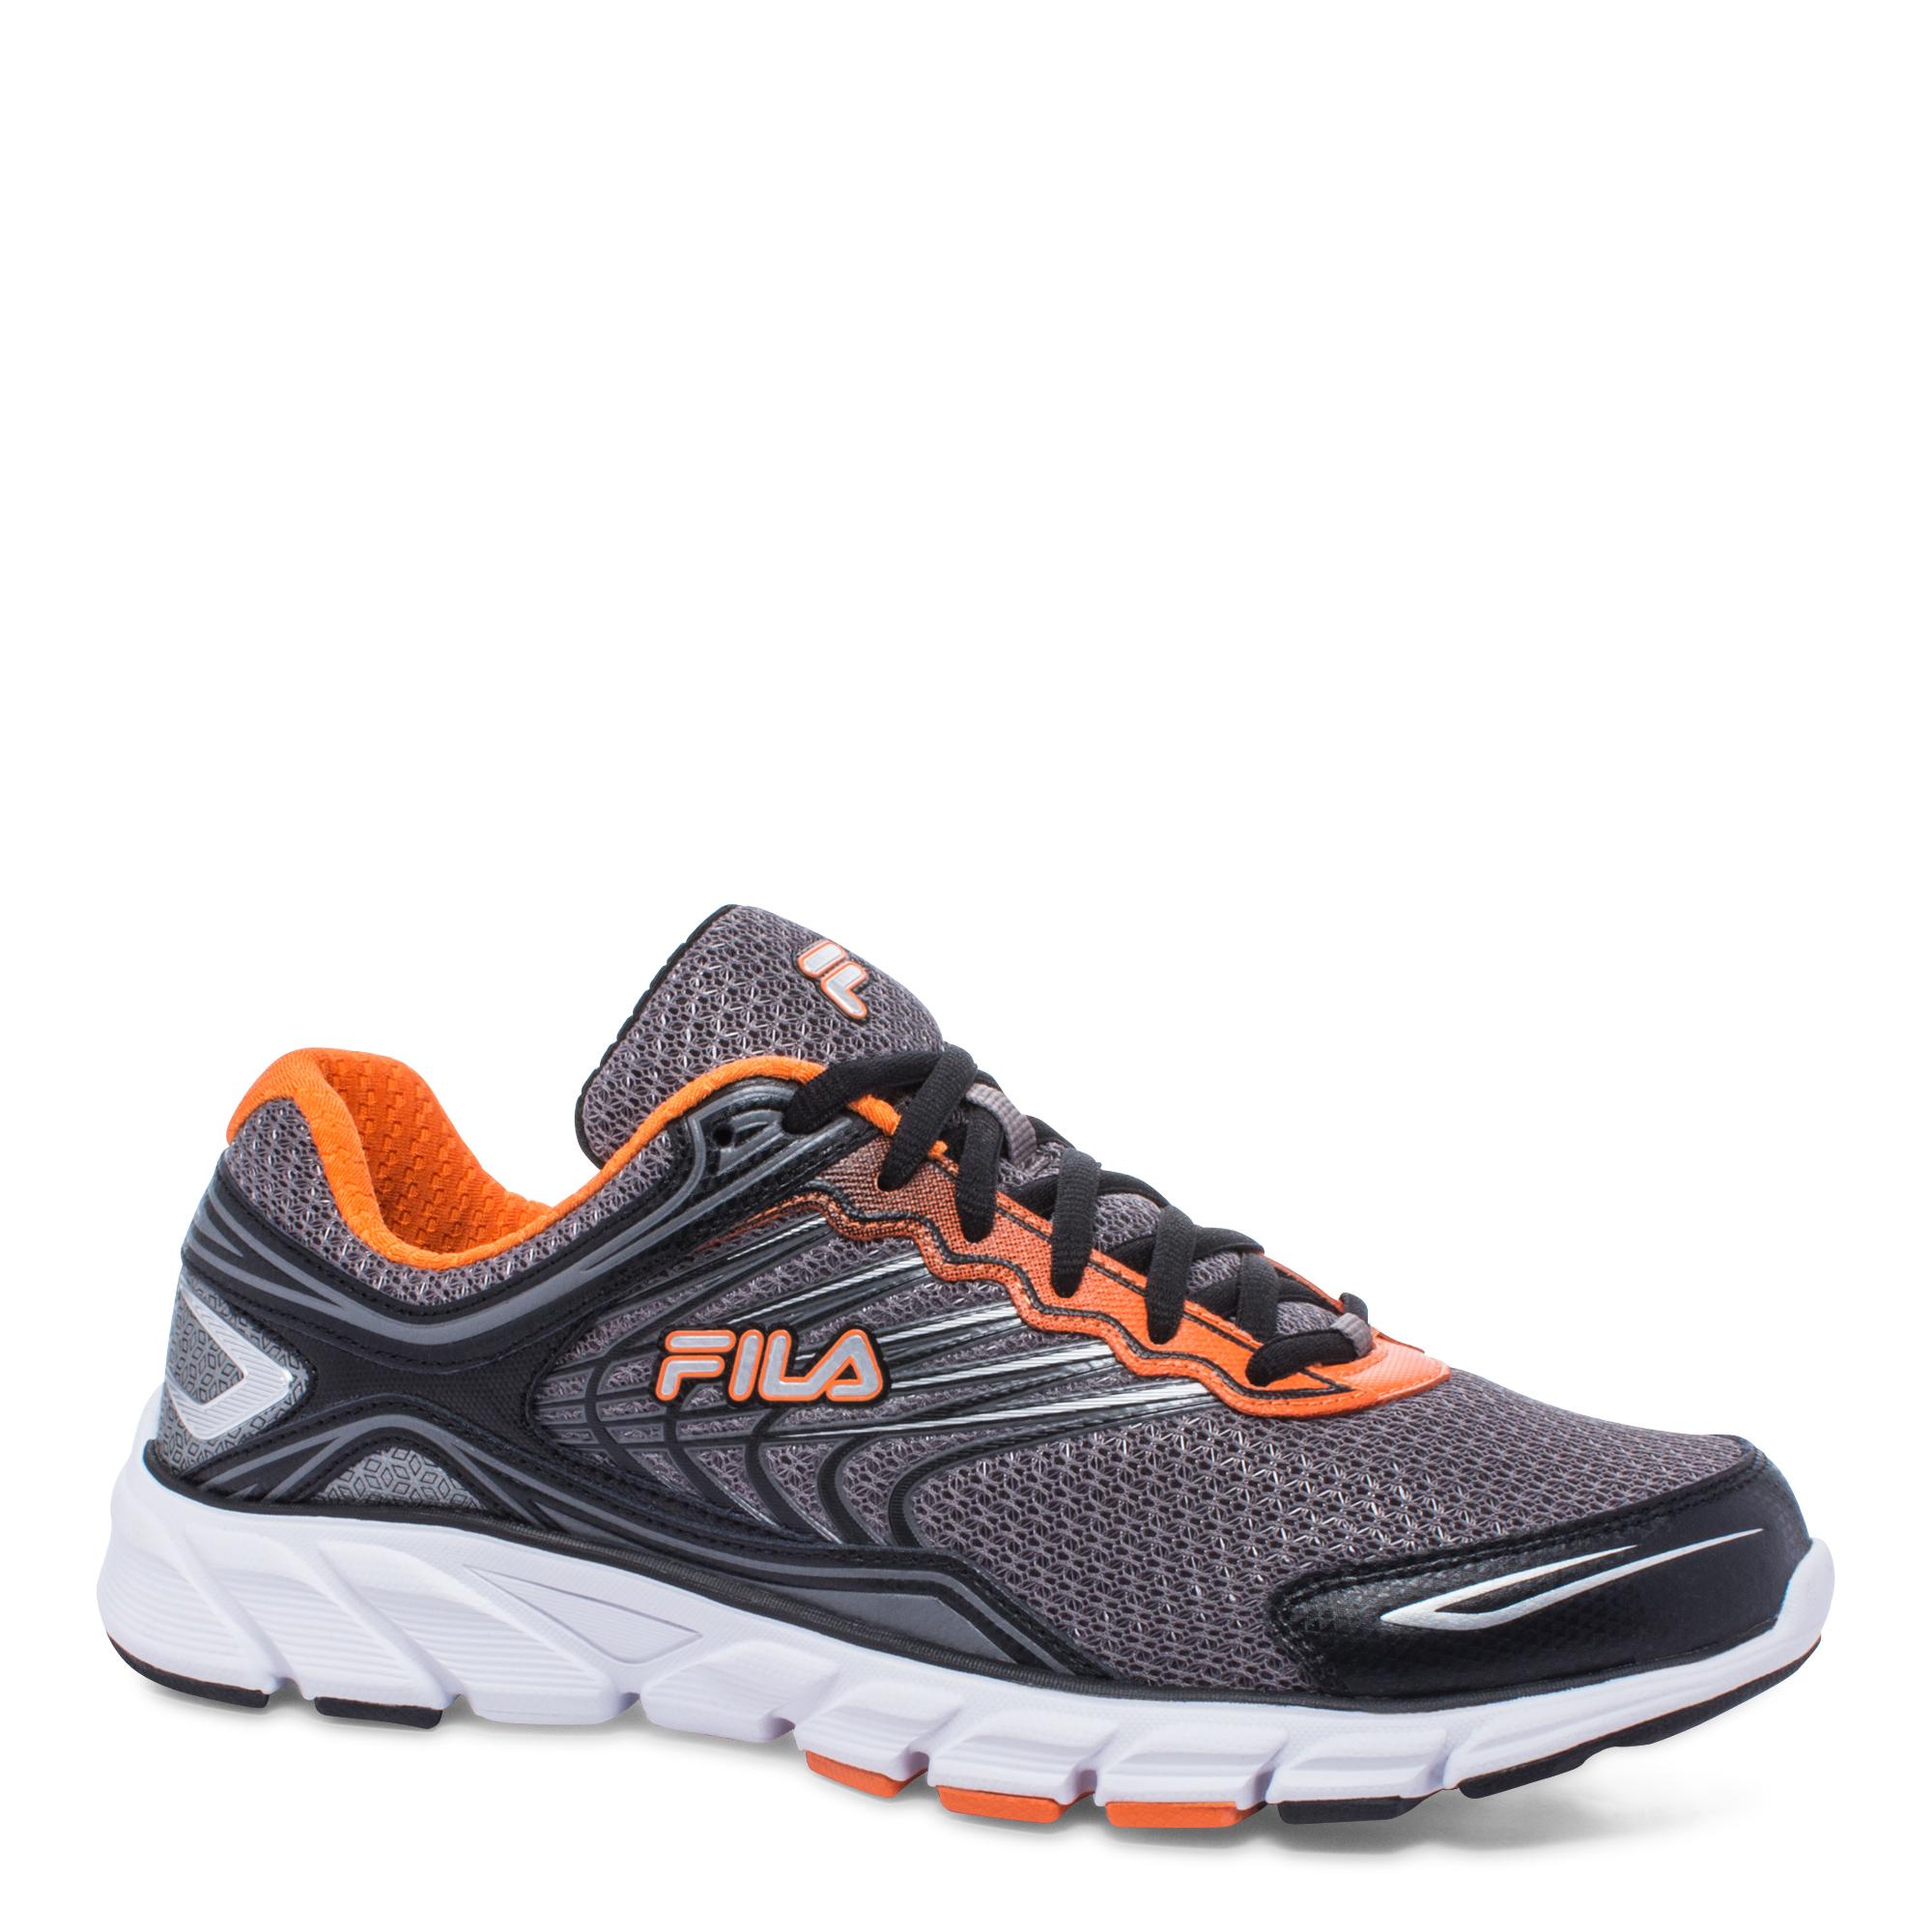 6fe02473dd96 Sale Mens Fila 51 Orange Shoes Discounts up To ZPt1Oxw